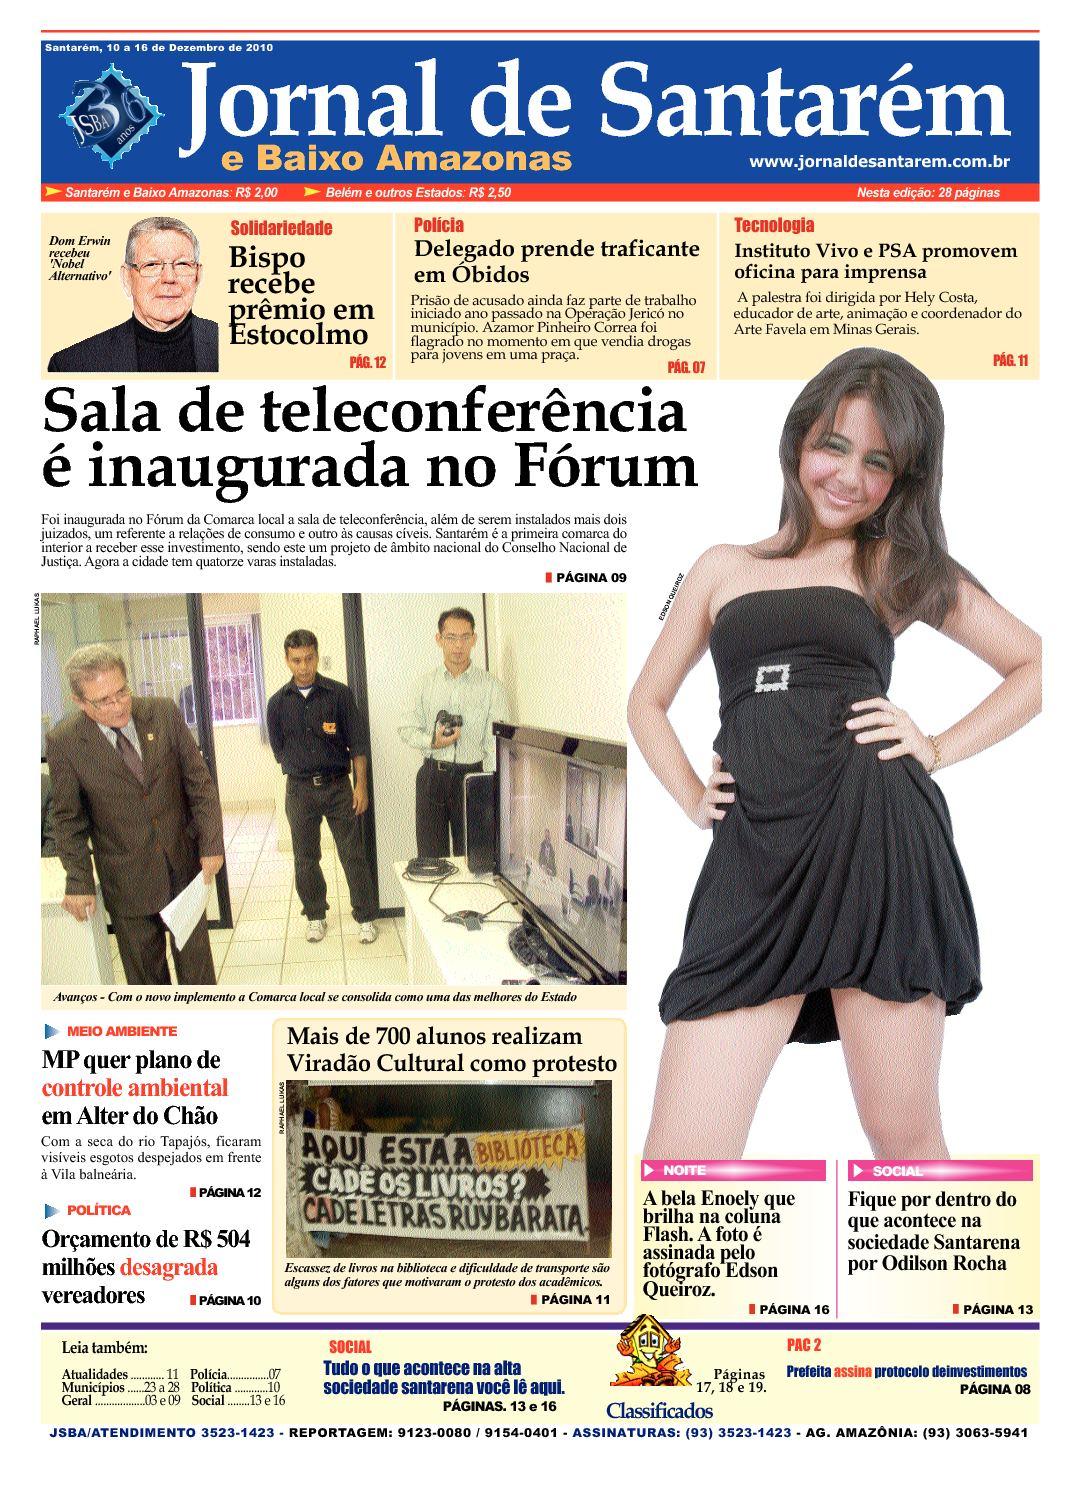 Calaméo - Jornal de Santarém de 10 a 16 de Dezembro de 2010 1cca29c761